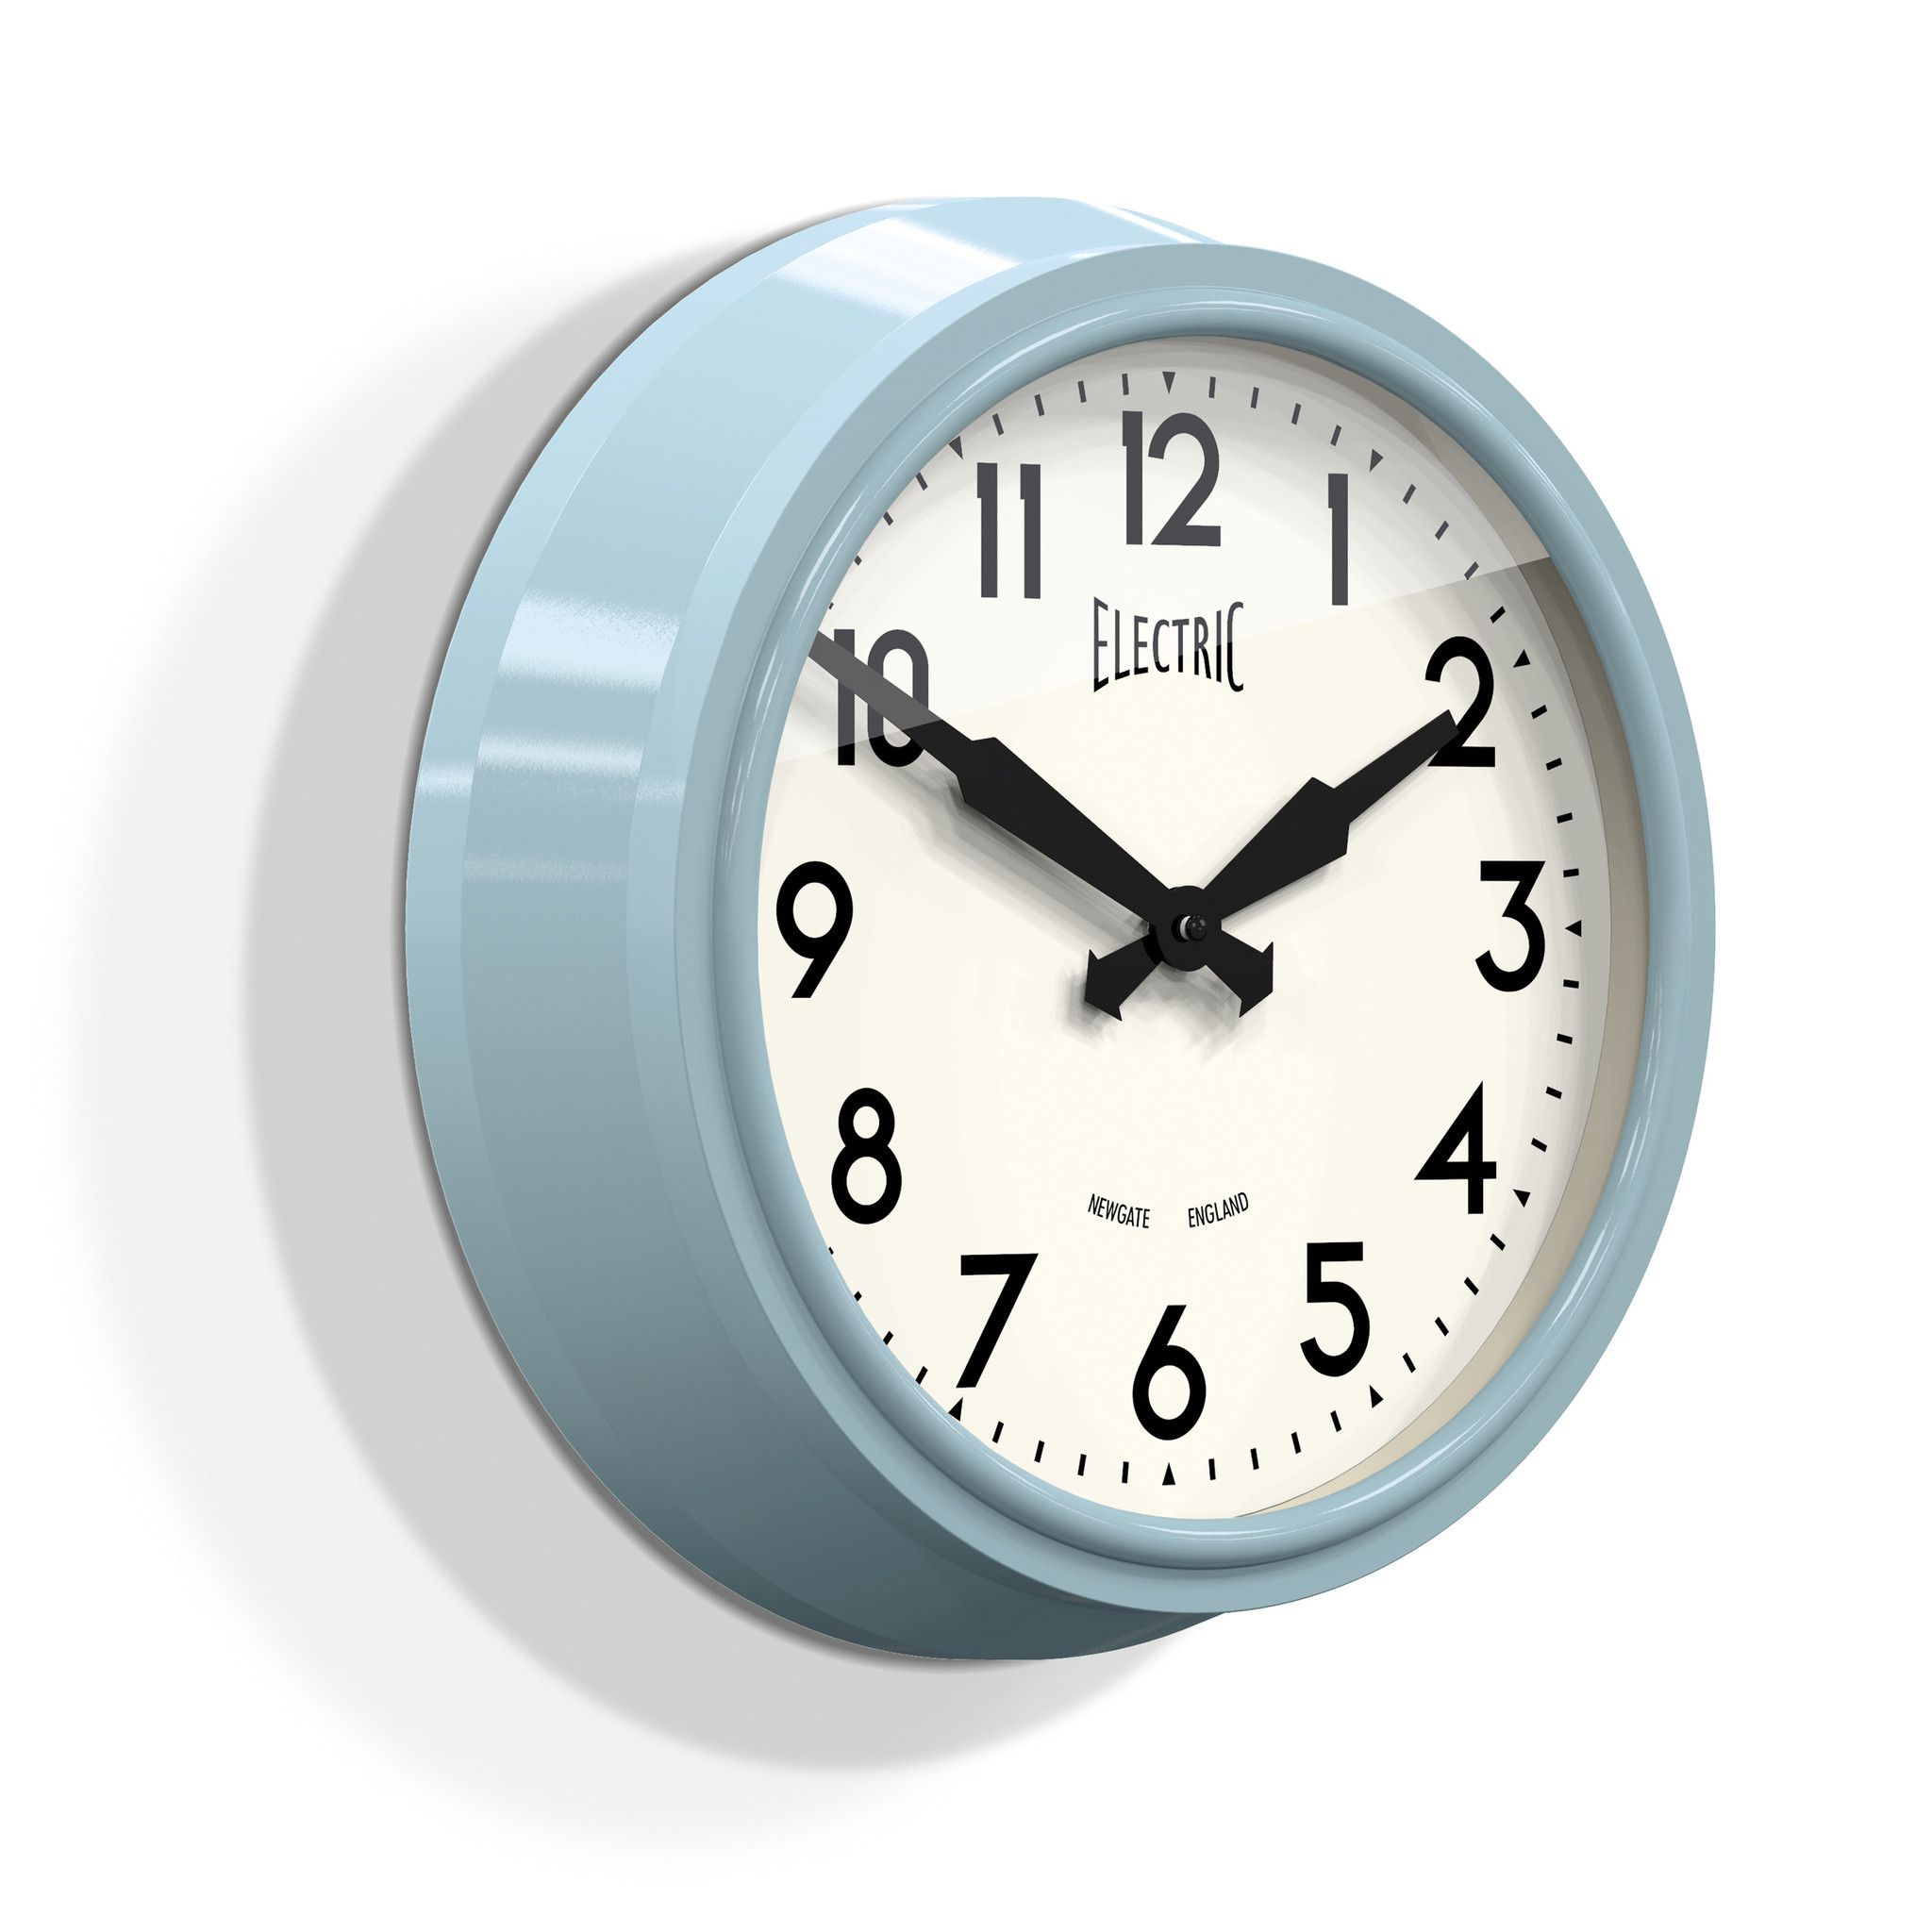 Medium Electric Wall Clock In Kettle Blue Design By Newgate Blue Wall Clocks Retro Wall Clock Wall Clock